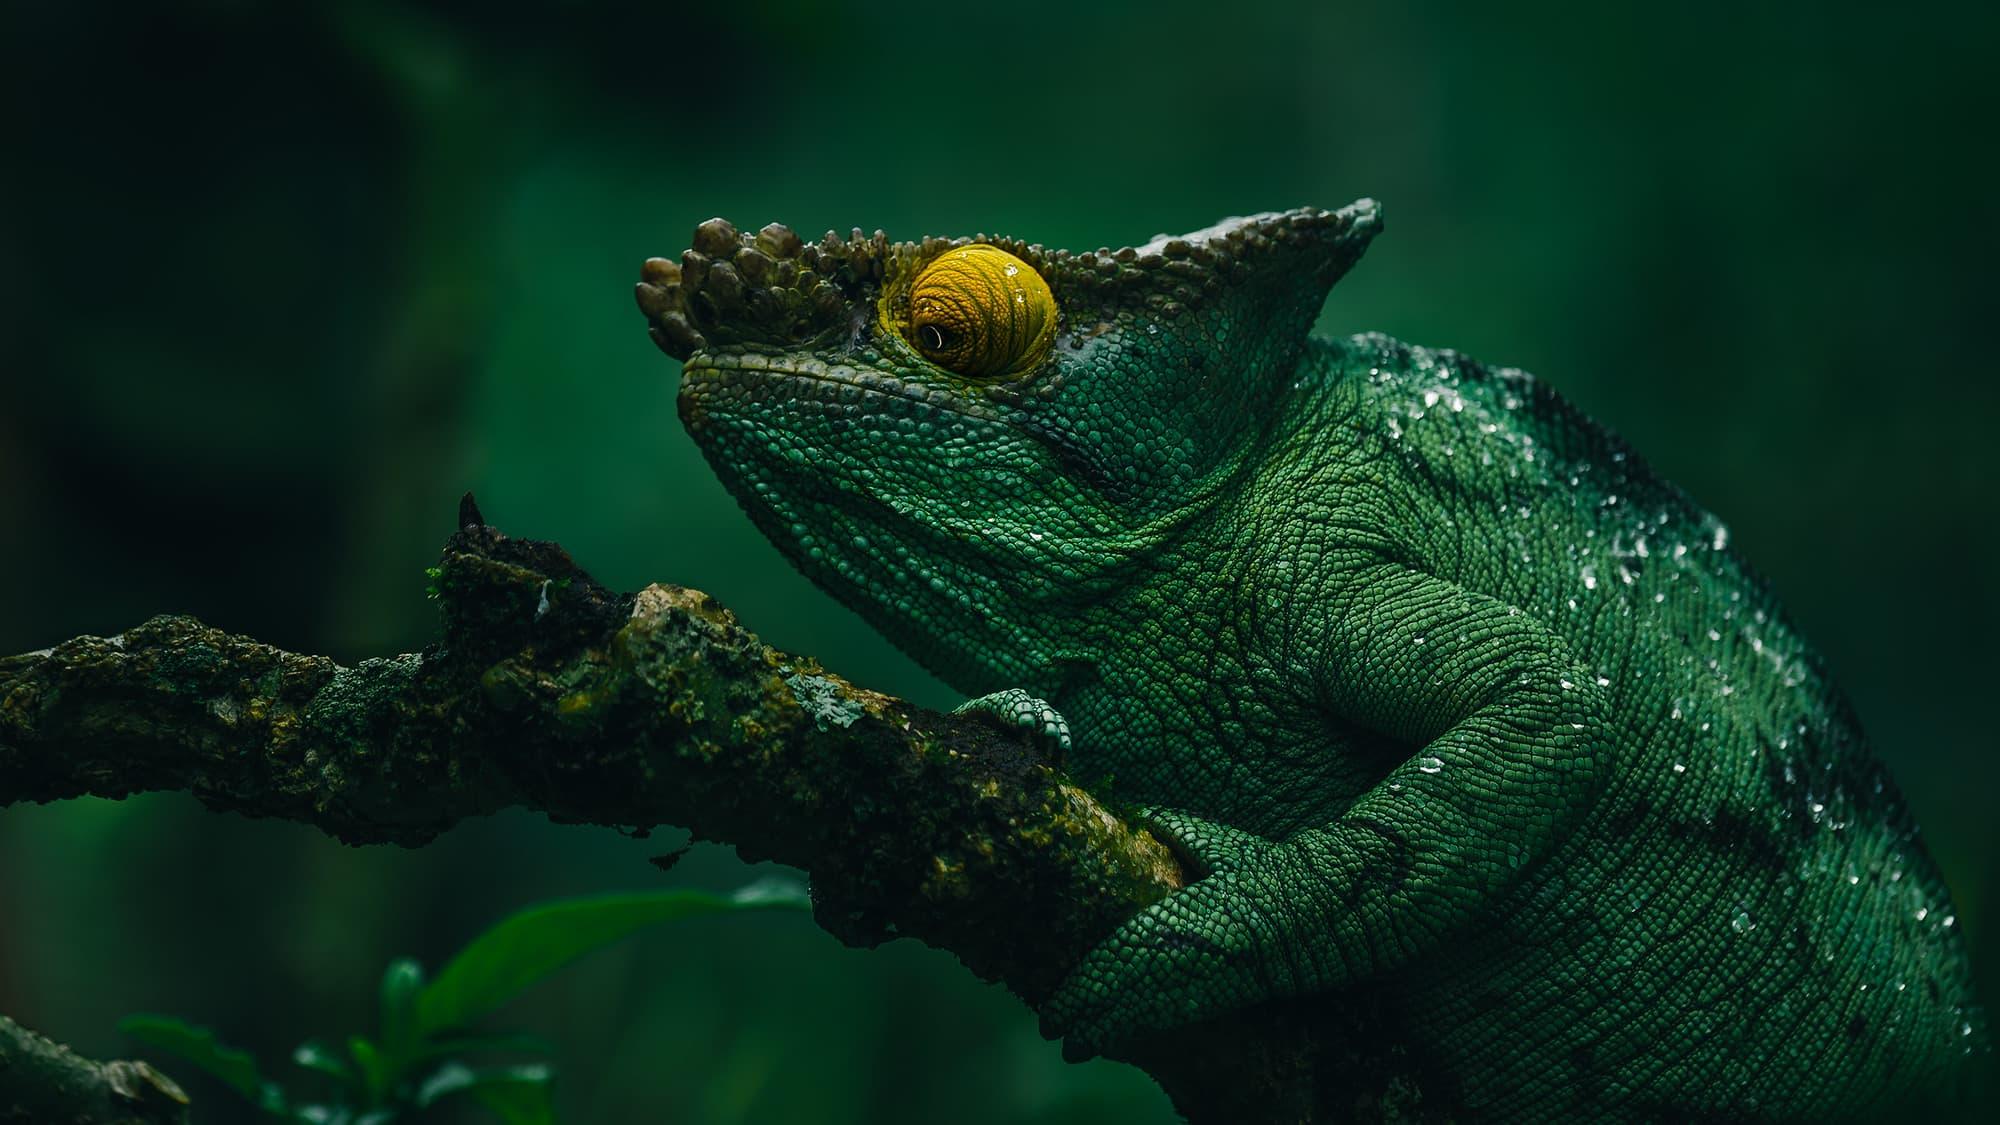 Ben Simon Rehn Fotografie - Amphibien in Madagaskar